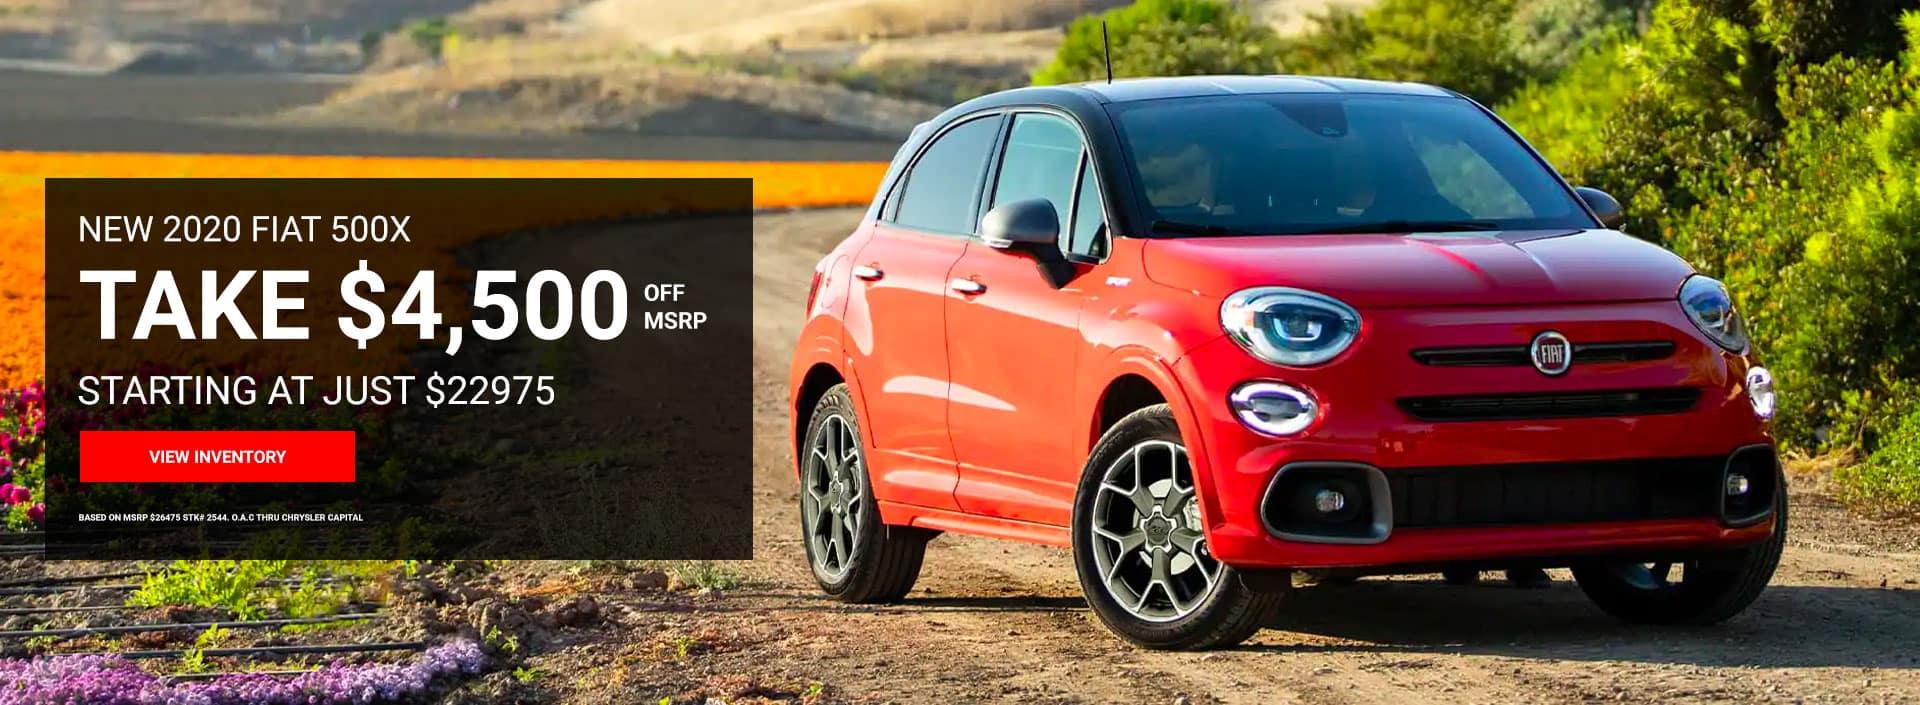 Fiat 500X $4500 off MSRP